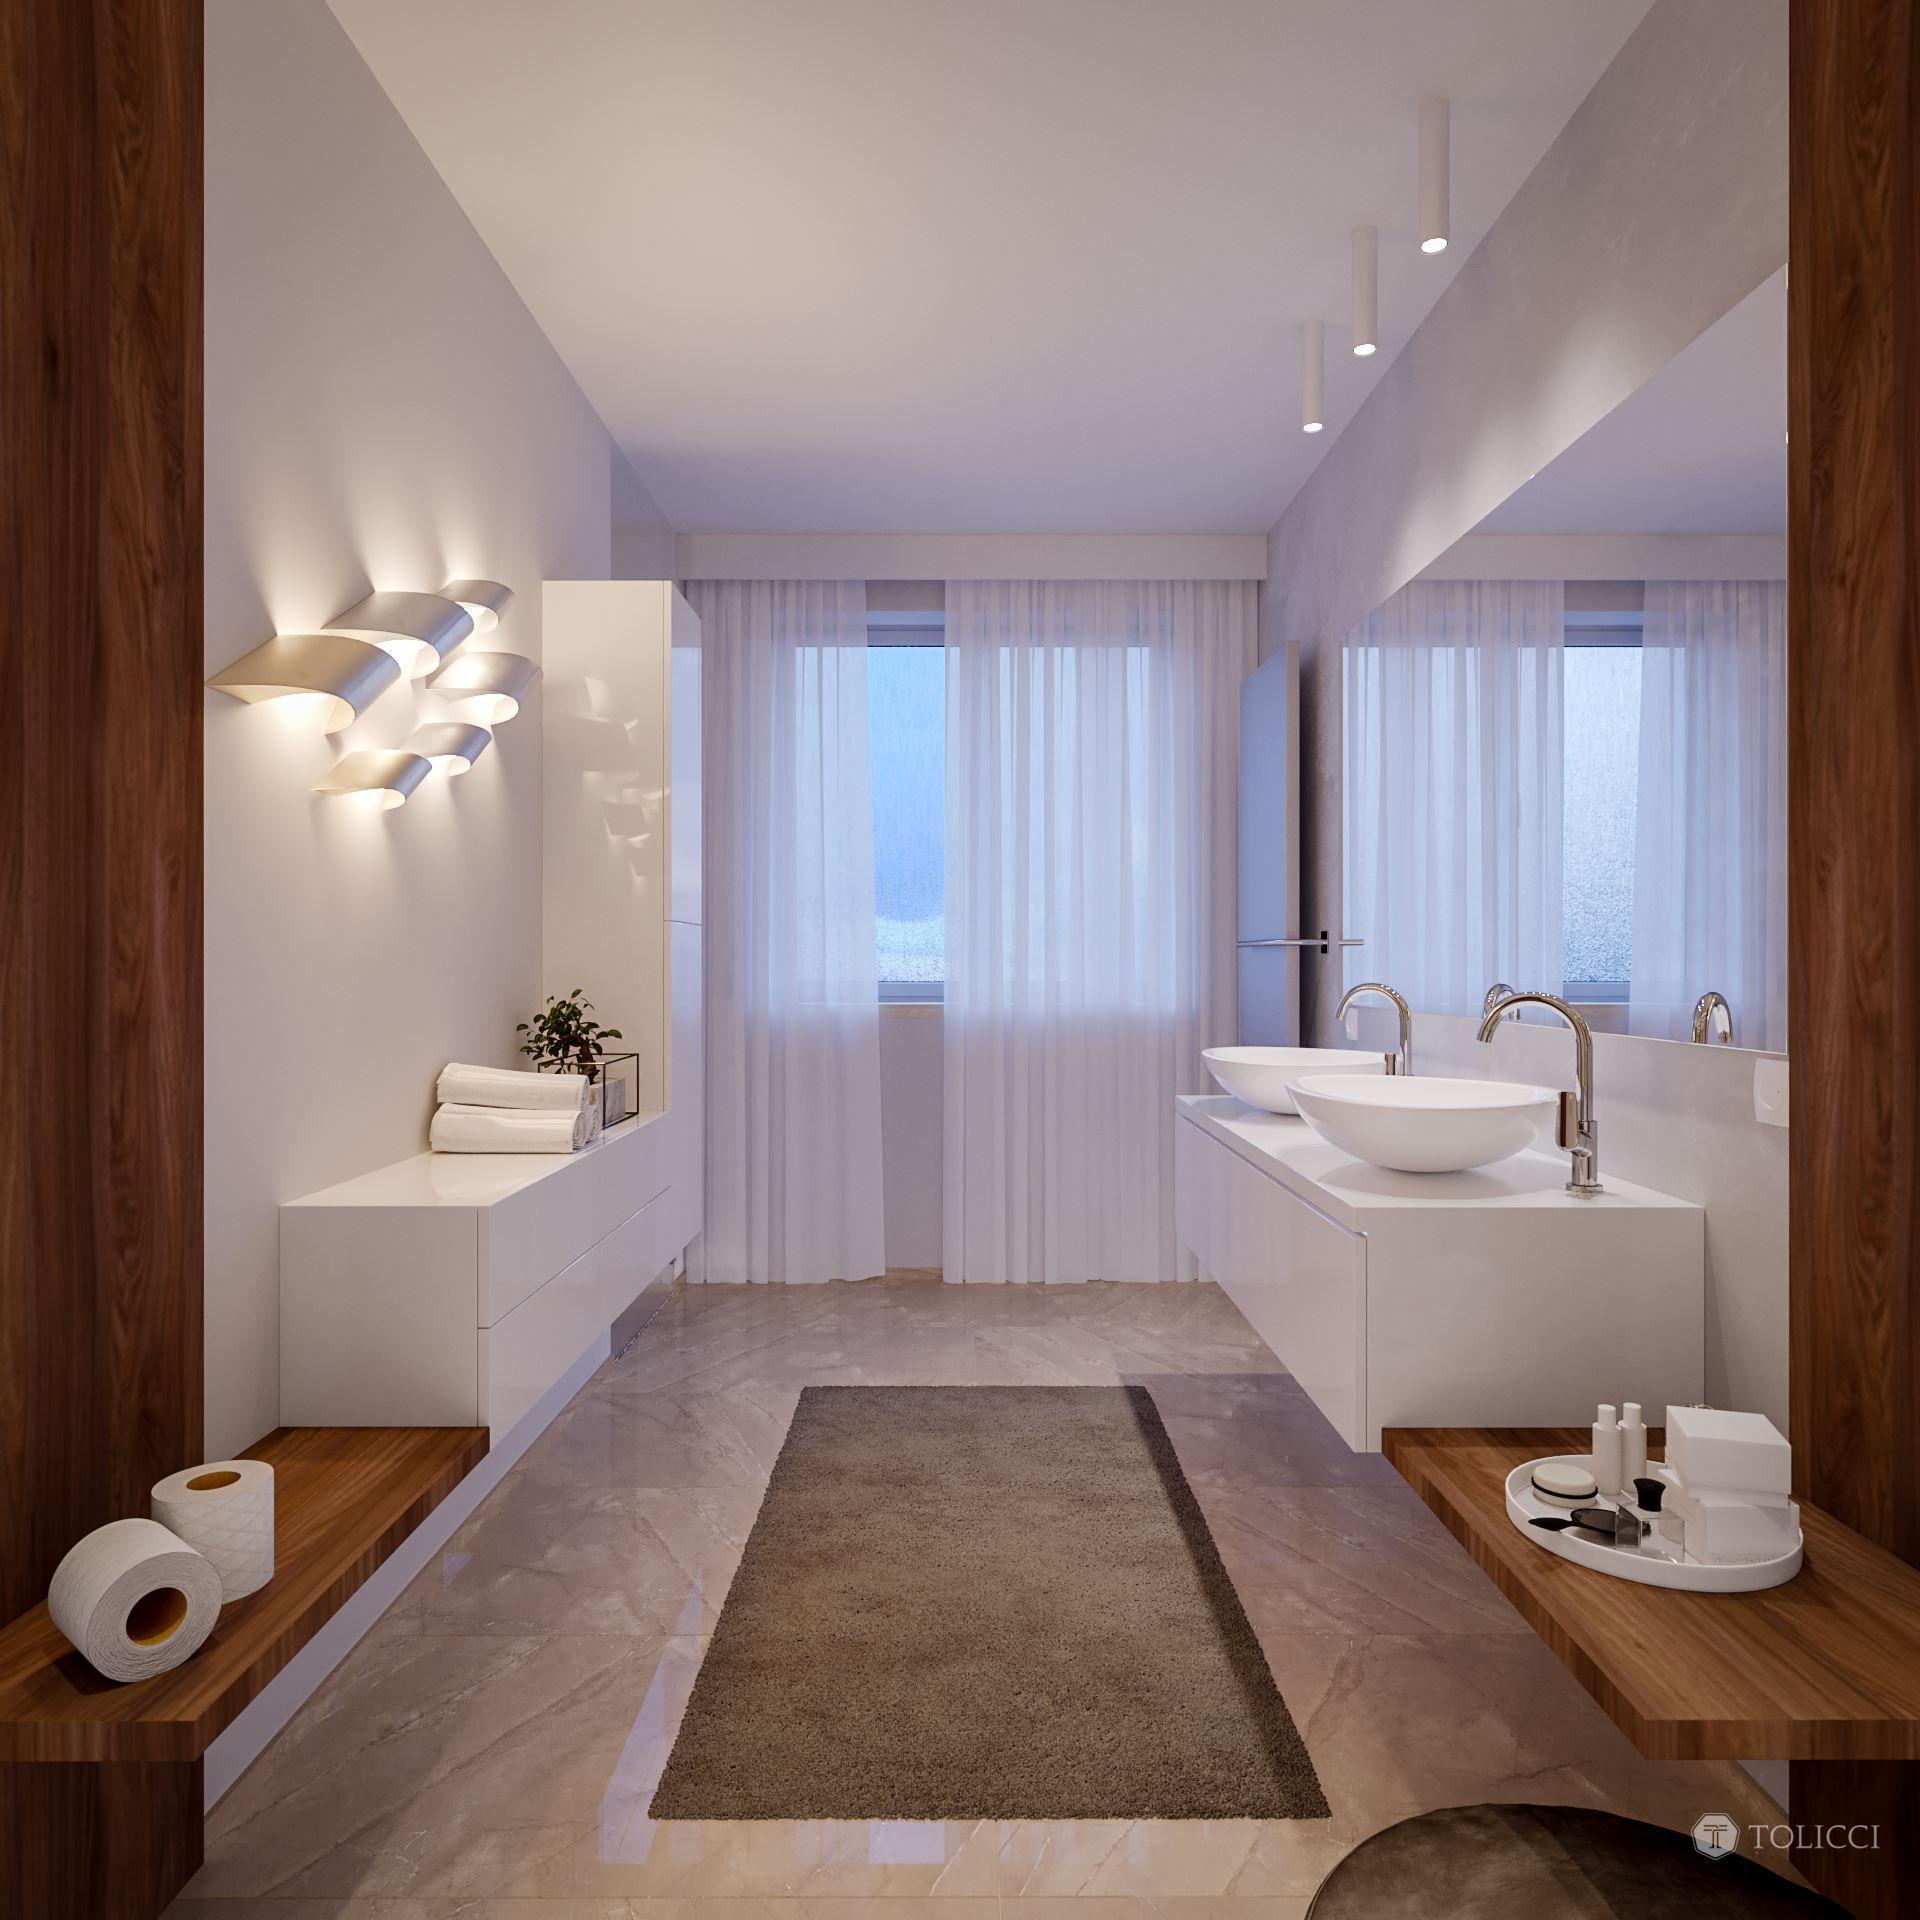 Luxusna Moderna Kupelna, Vana, Umyvadlo, Taliansky Dizajn, Bath, Washbasin, Luxury